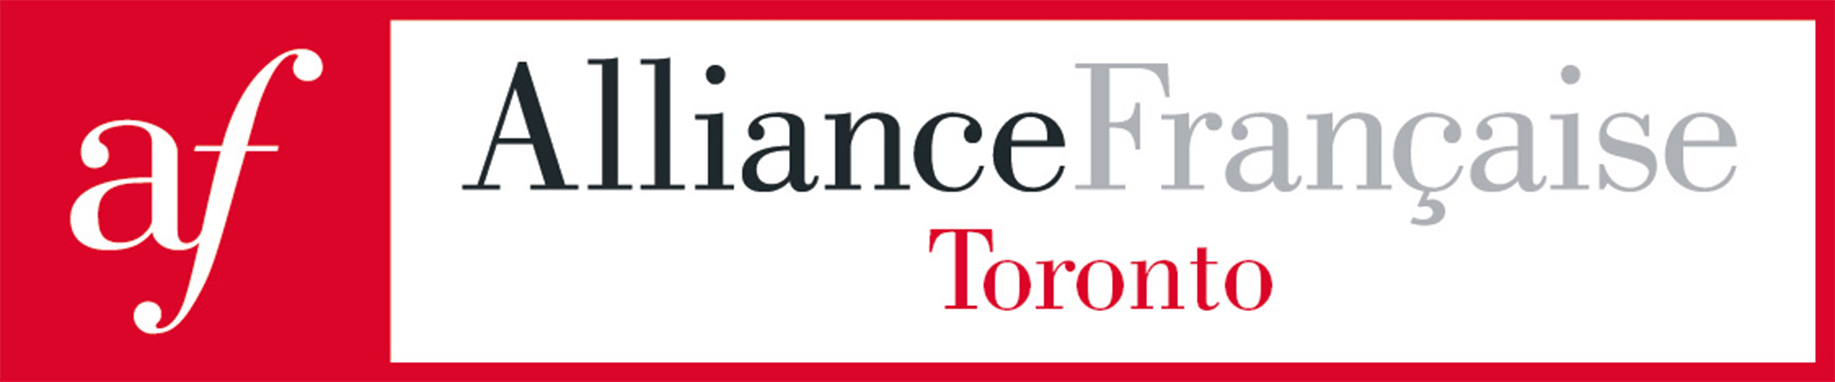 Alliance Française Toronto